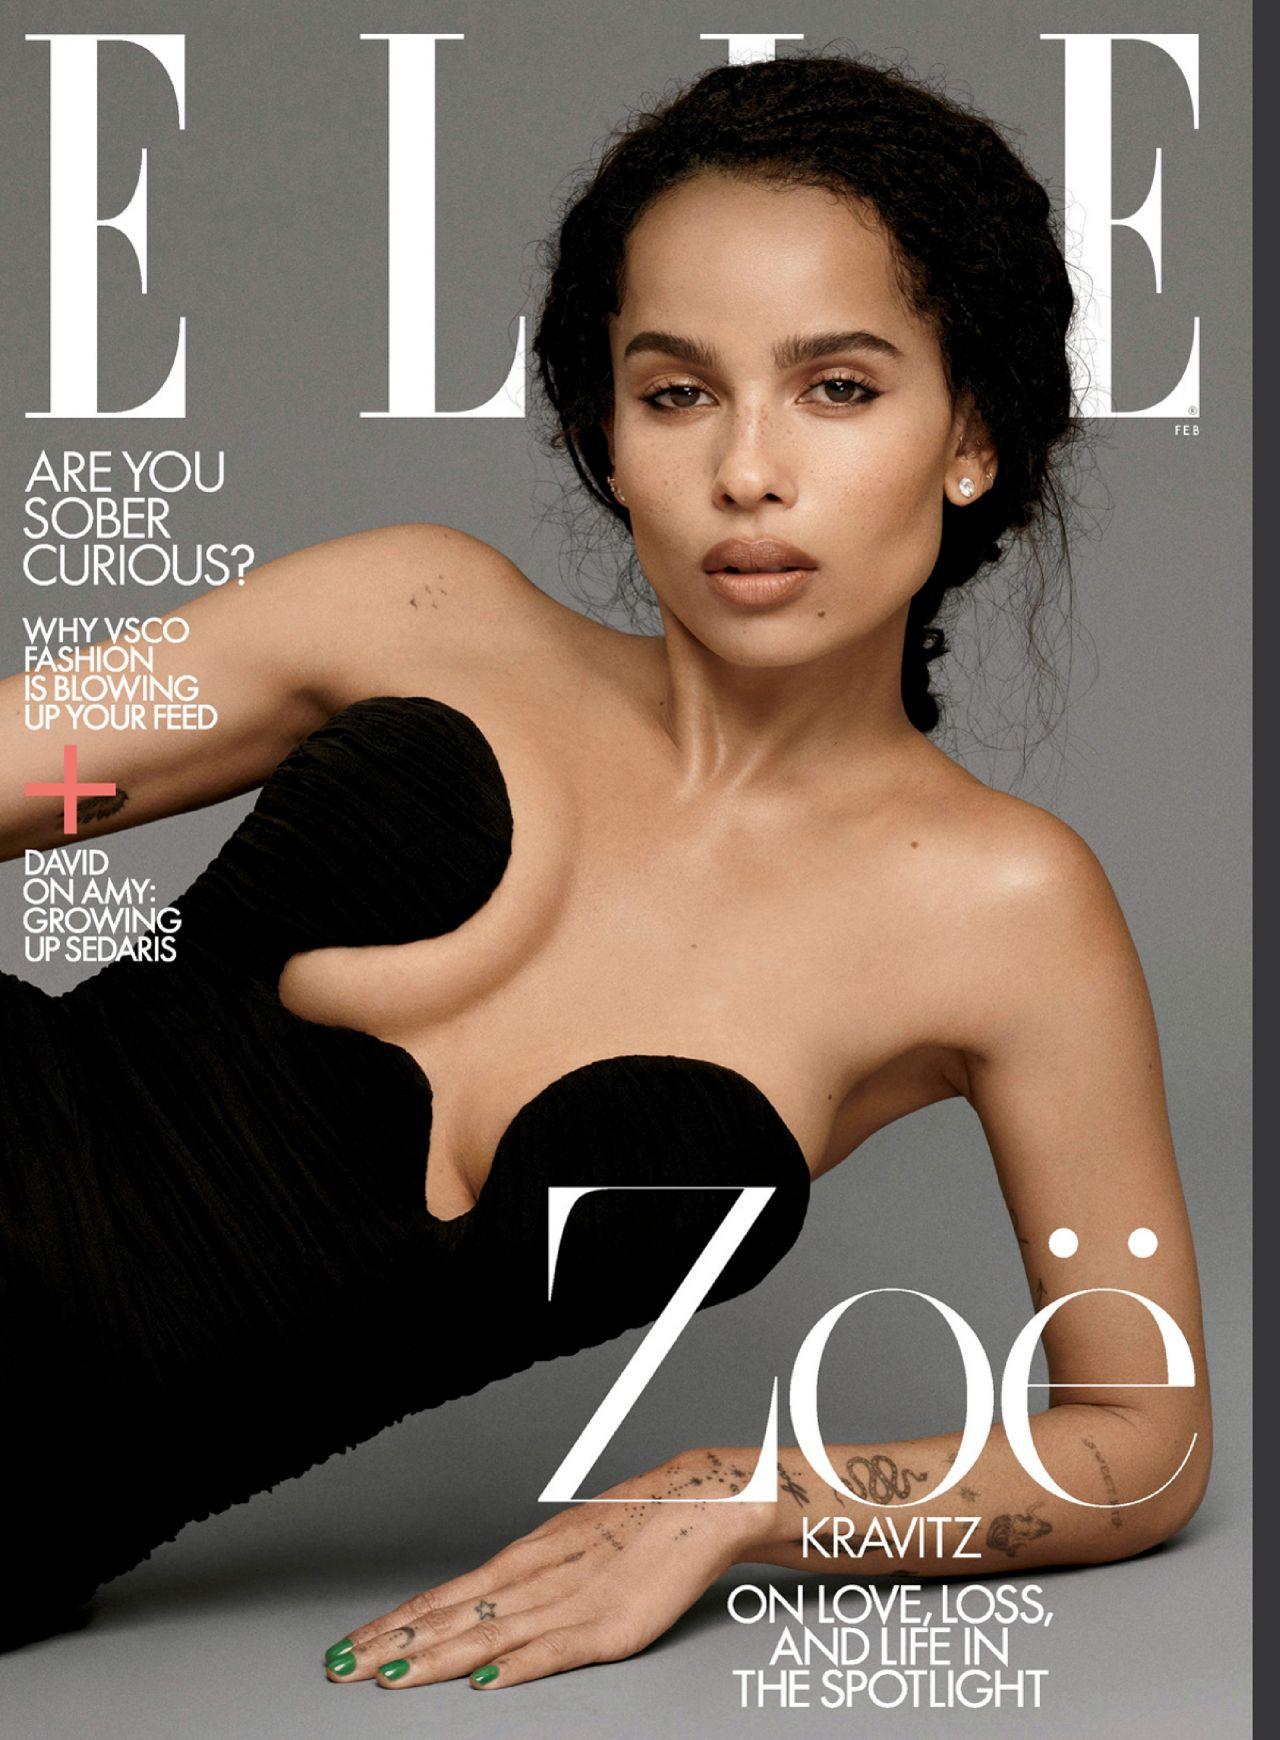 zoe-kravitz-covers-elle-magazine-us-february-2020-issue